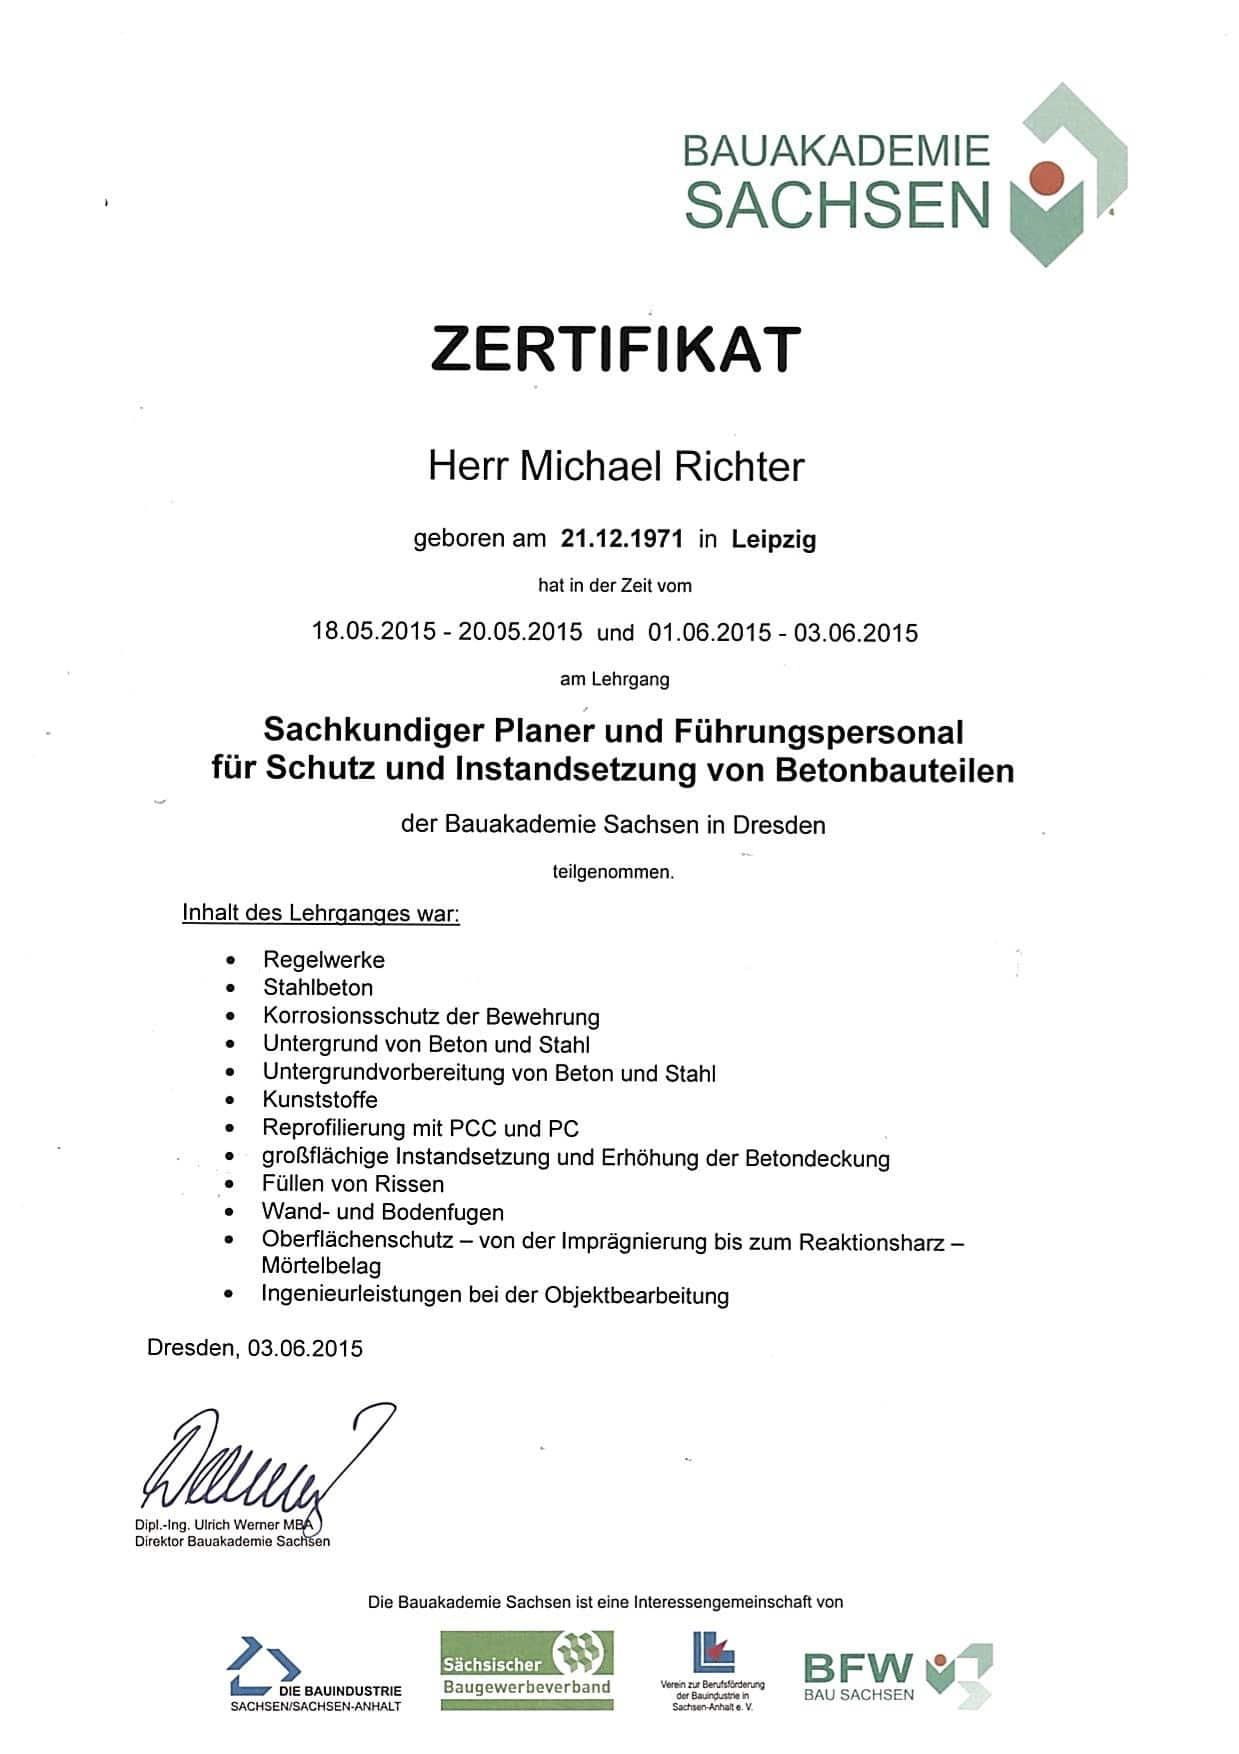 Sachkundiger Planer Michael Richter